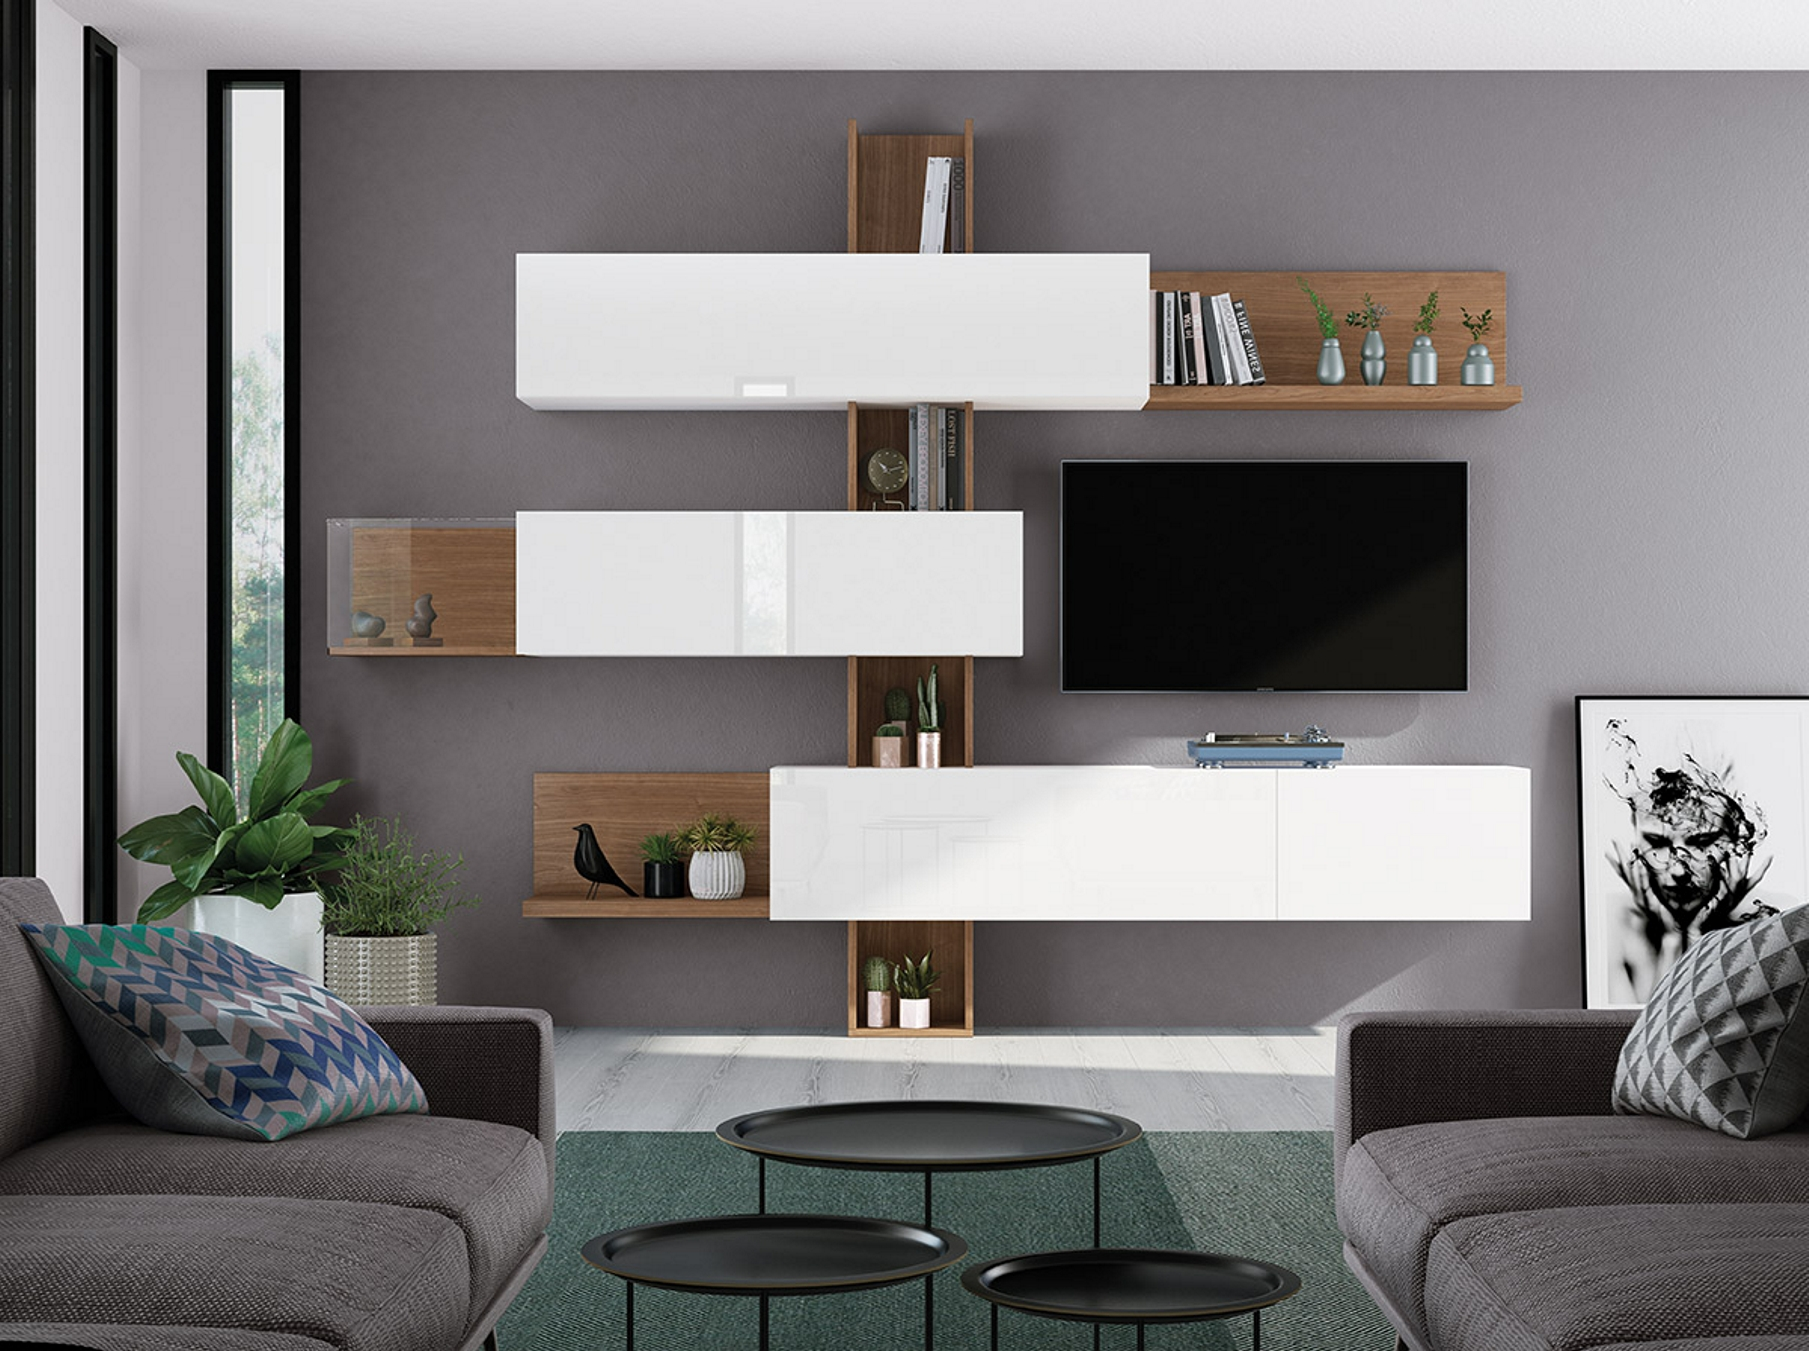 salon-moderno-Zion-3.0-muebles-paco-caballero-0907-5c8d32da040b6